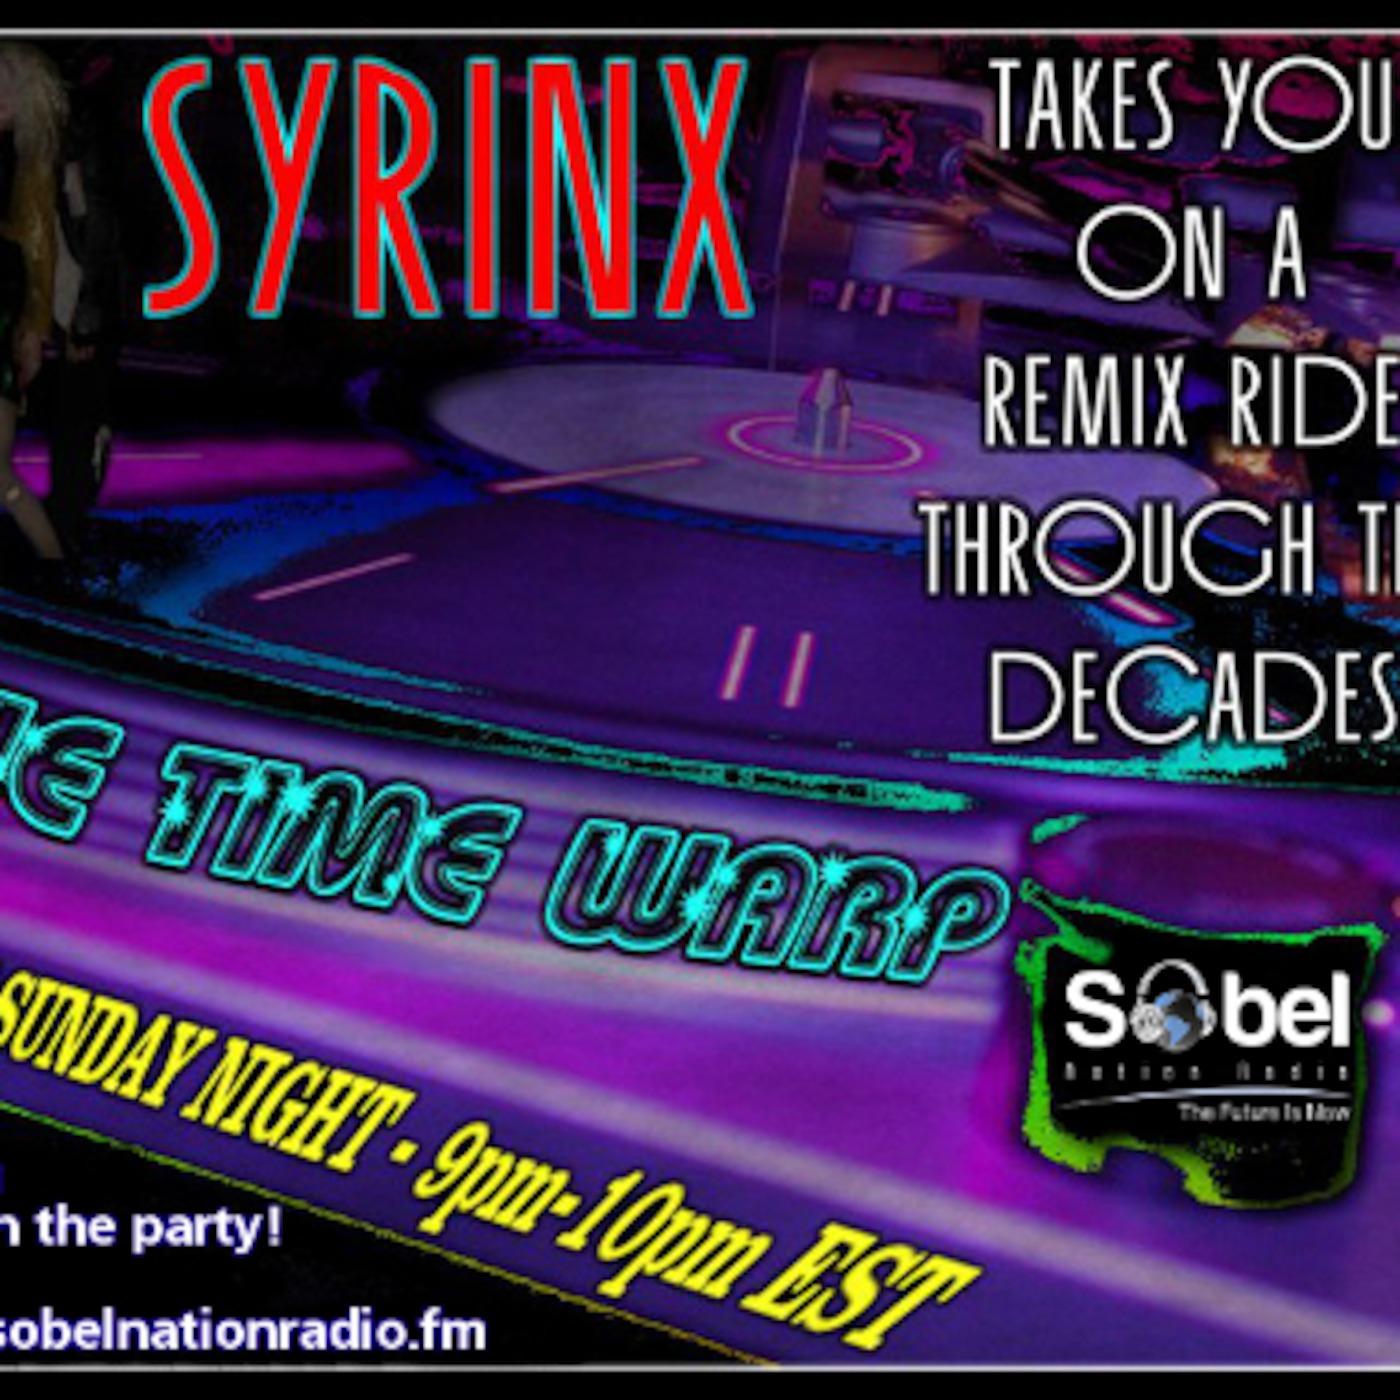 THE TIME WARP - Syrinx